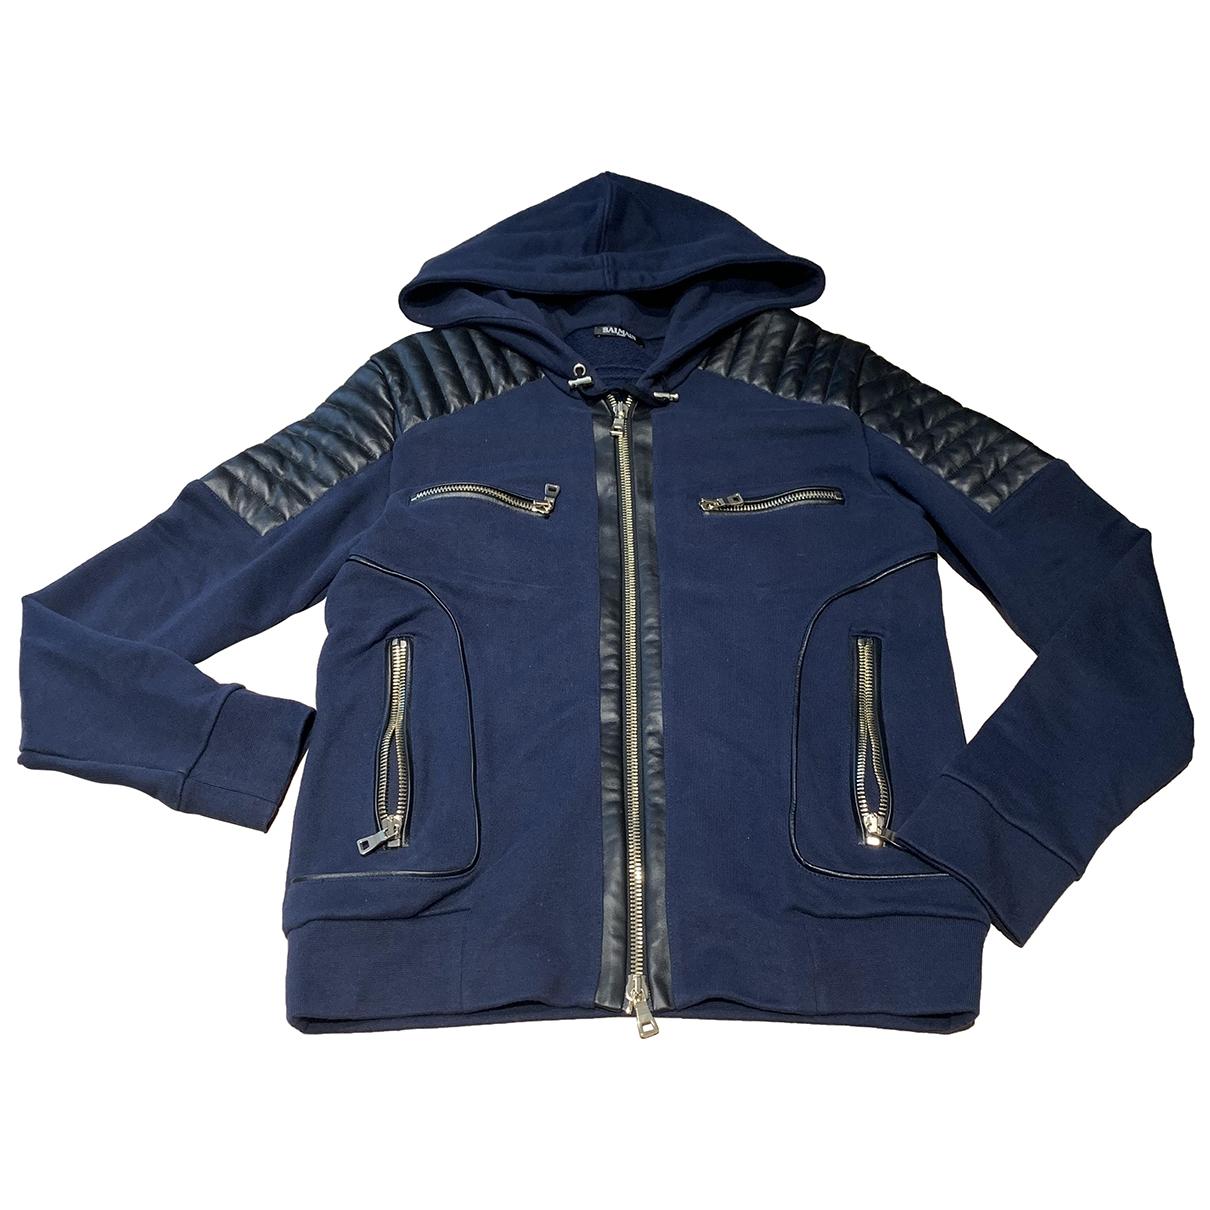 Balmain \N Navy Leather jacket  for Men S International